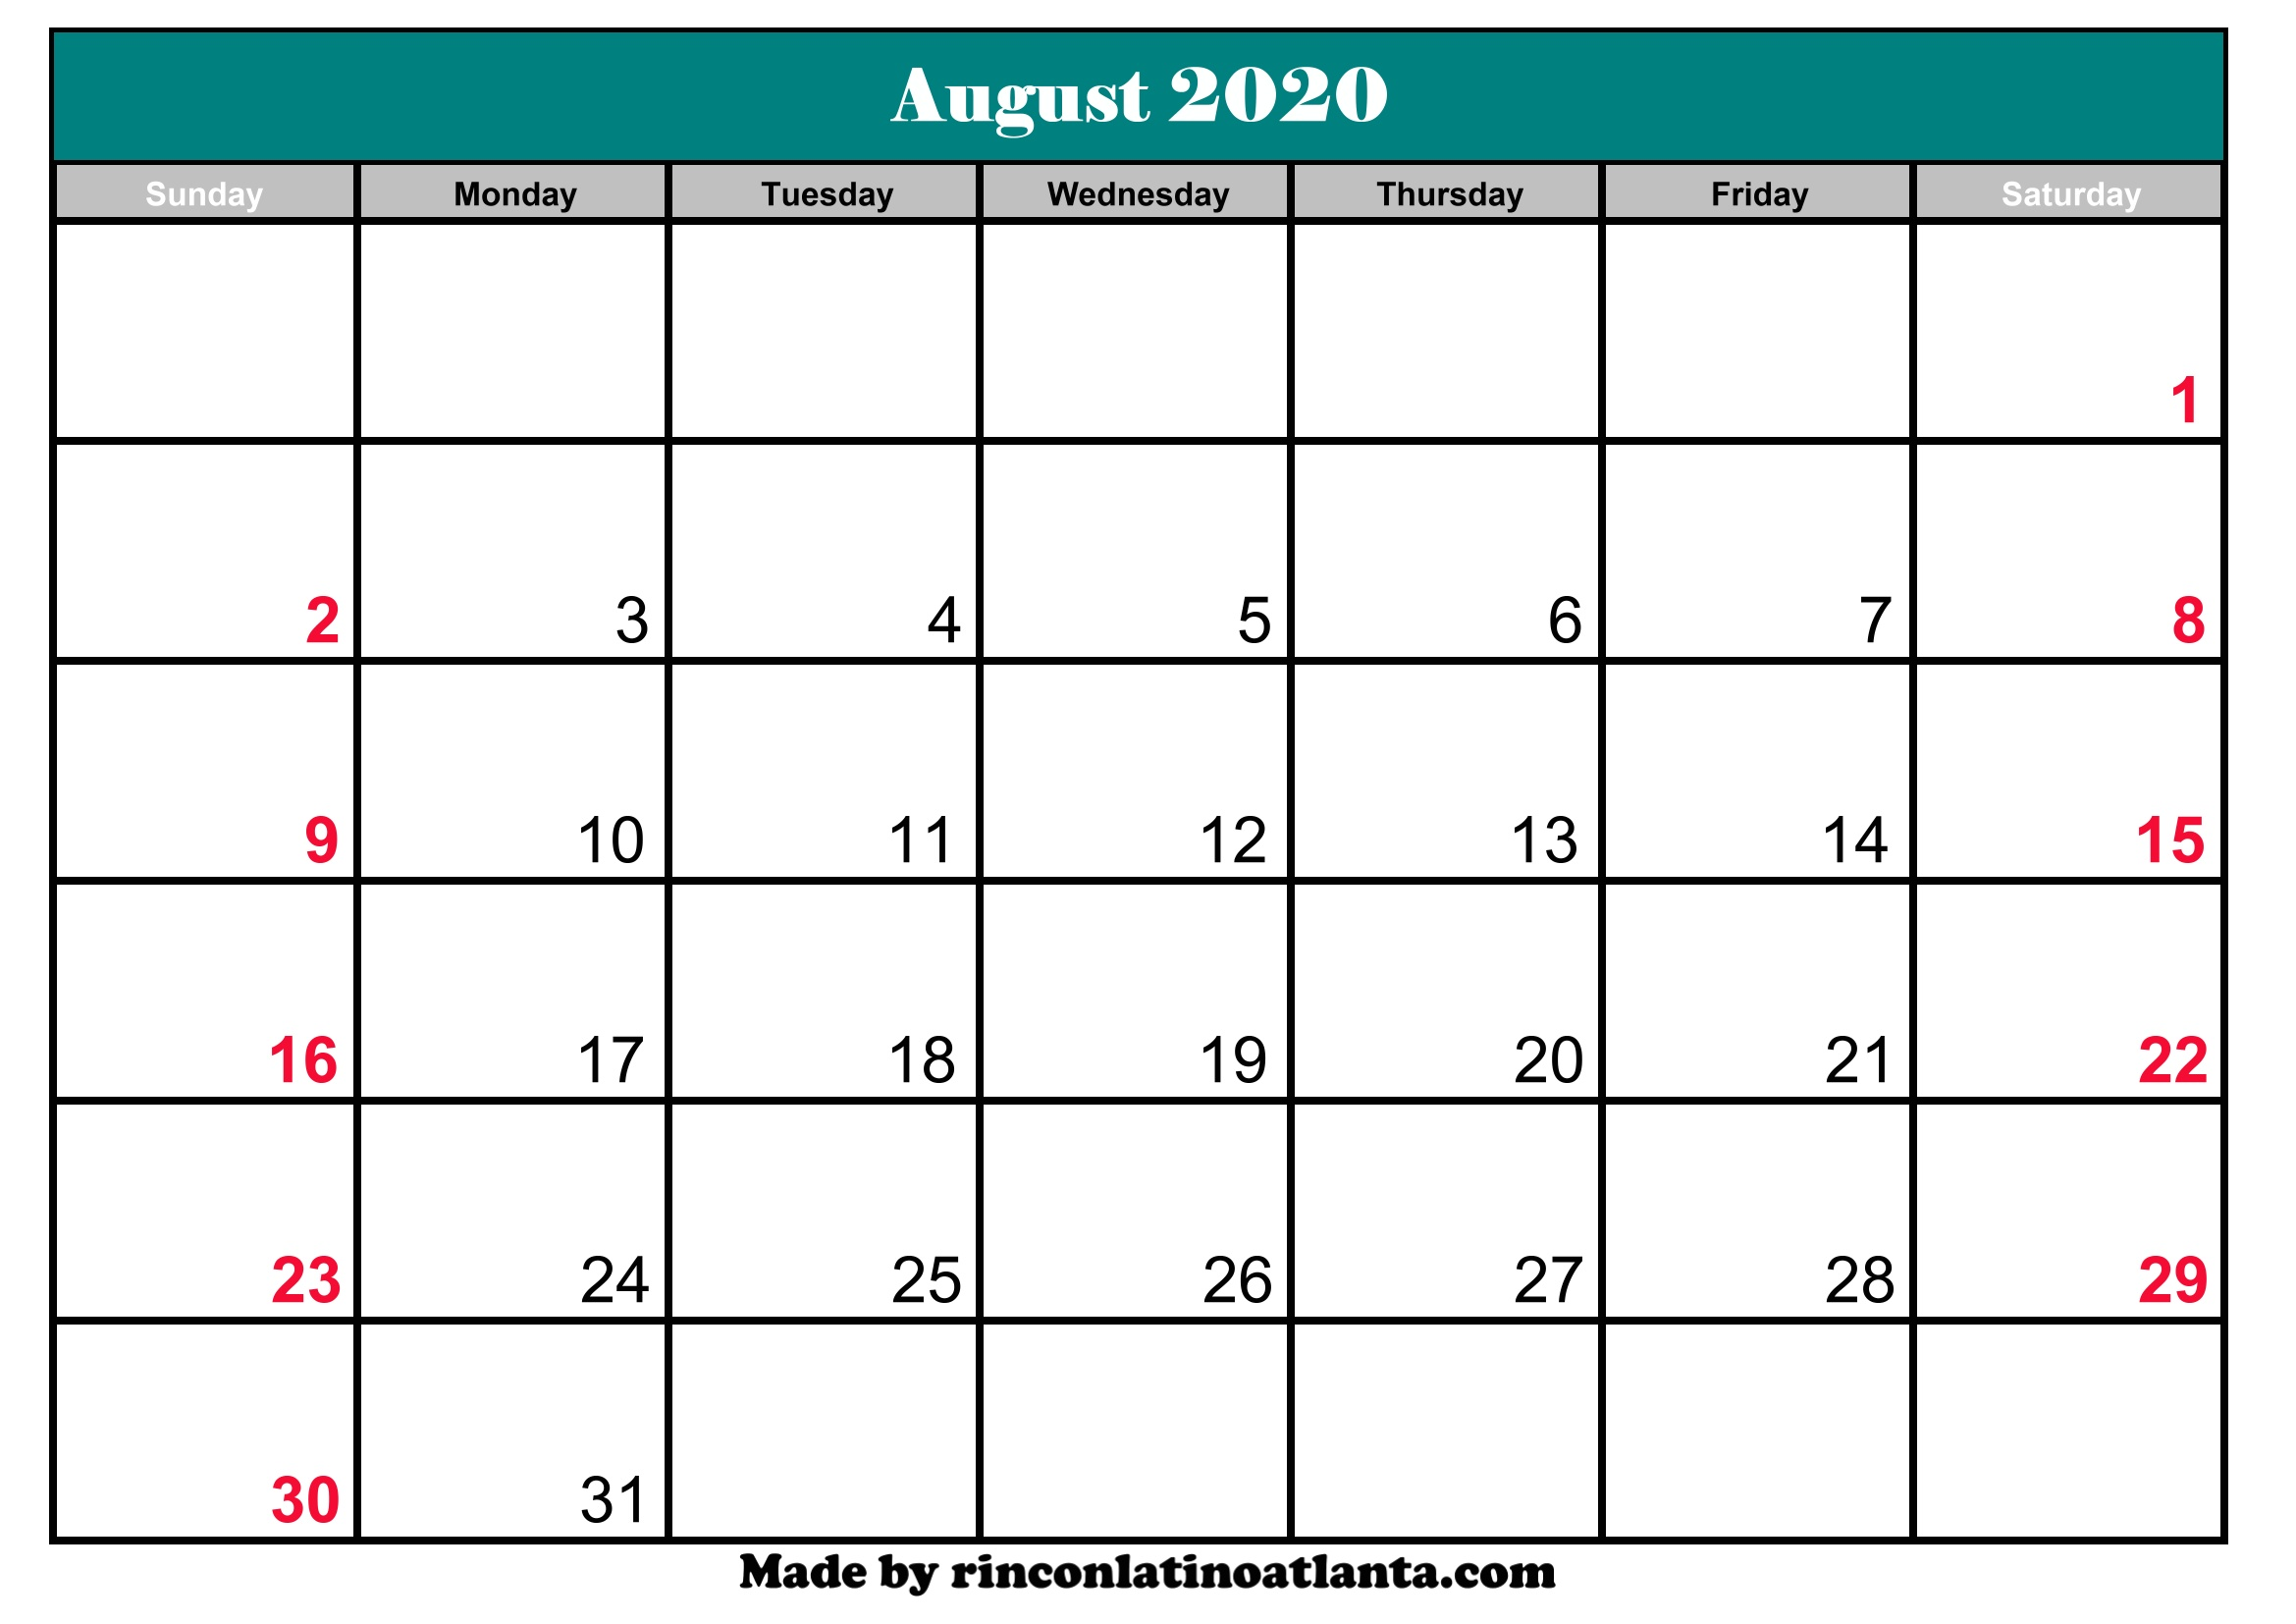 Calendar August 2020 Printable.August 2020 Calendar Template Printable Editable Calendar Template